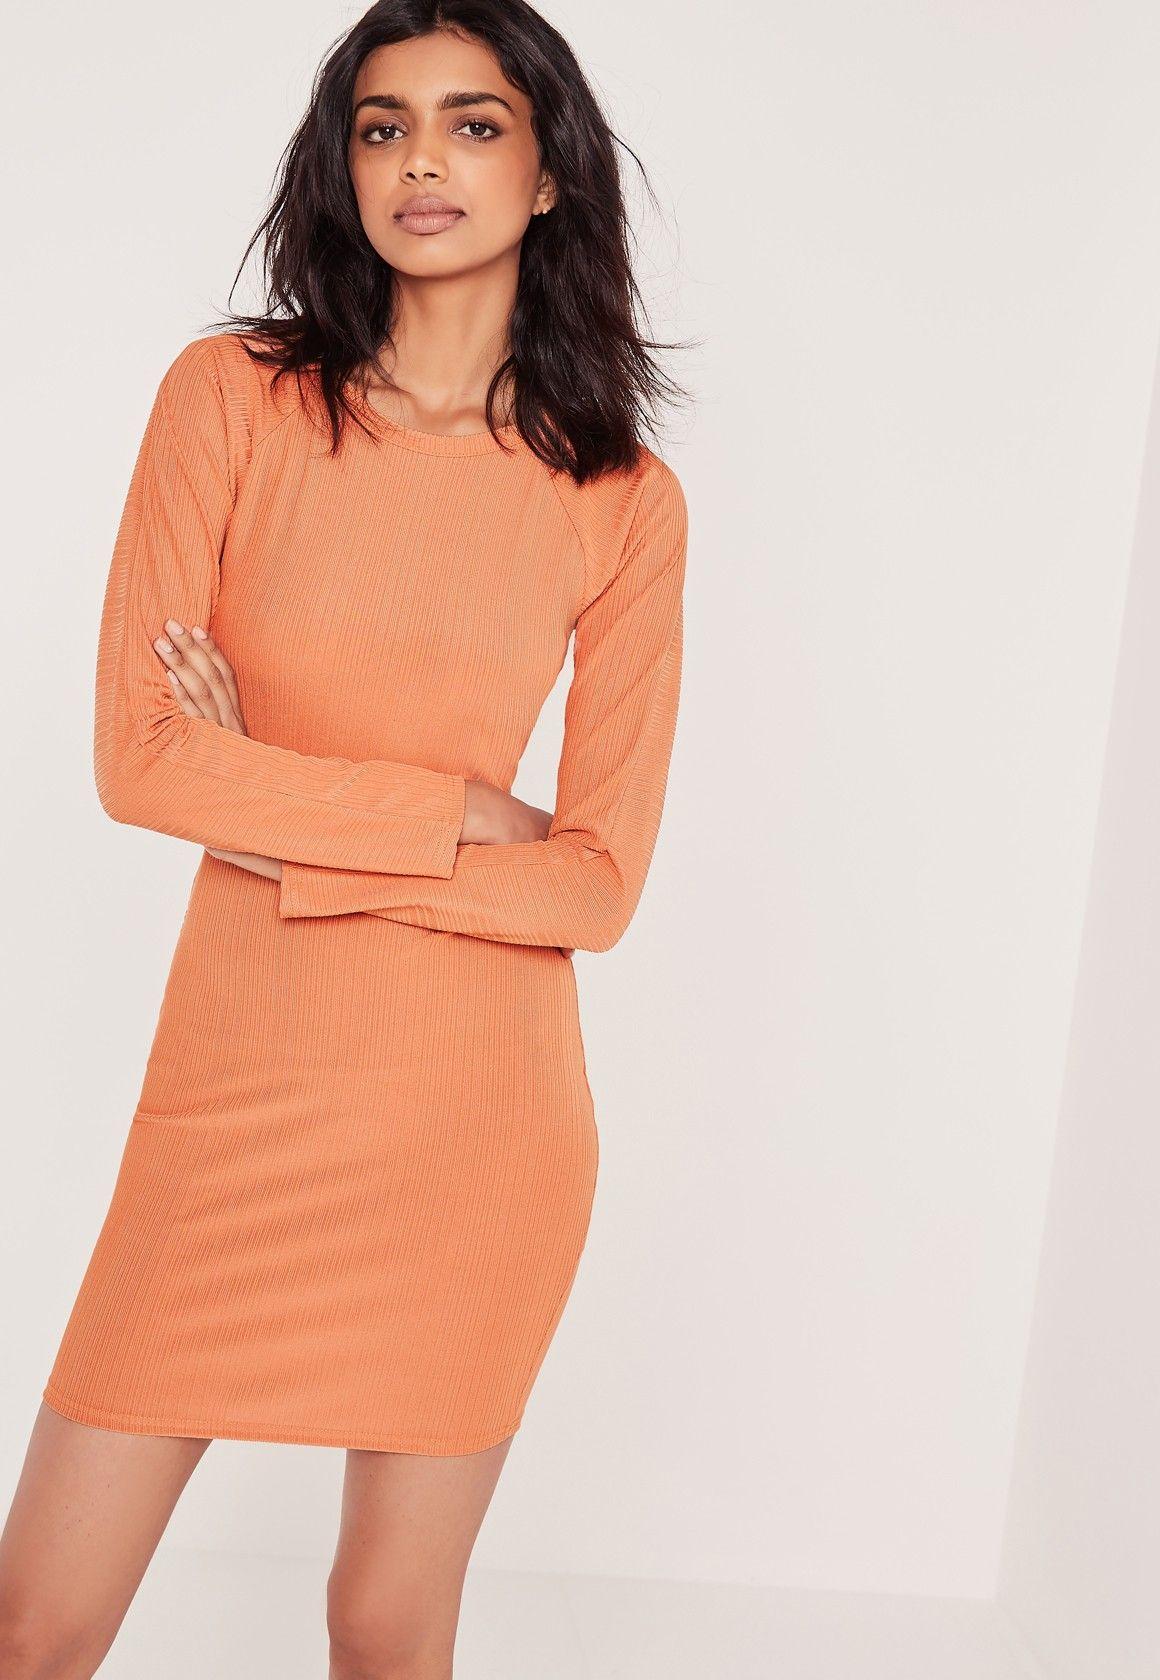 Rib Cross Back Bodycon Mini Dress Orange - Missguided